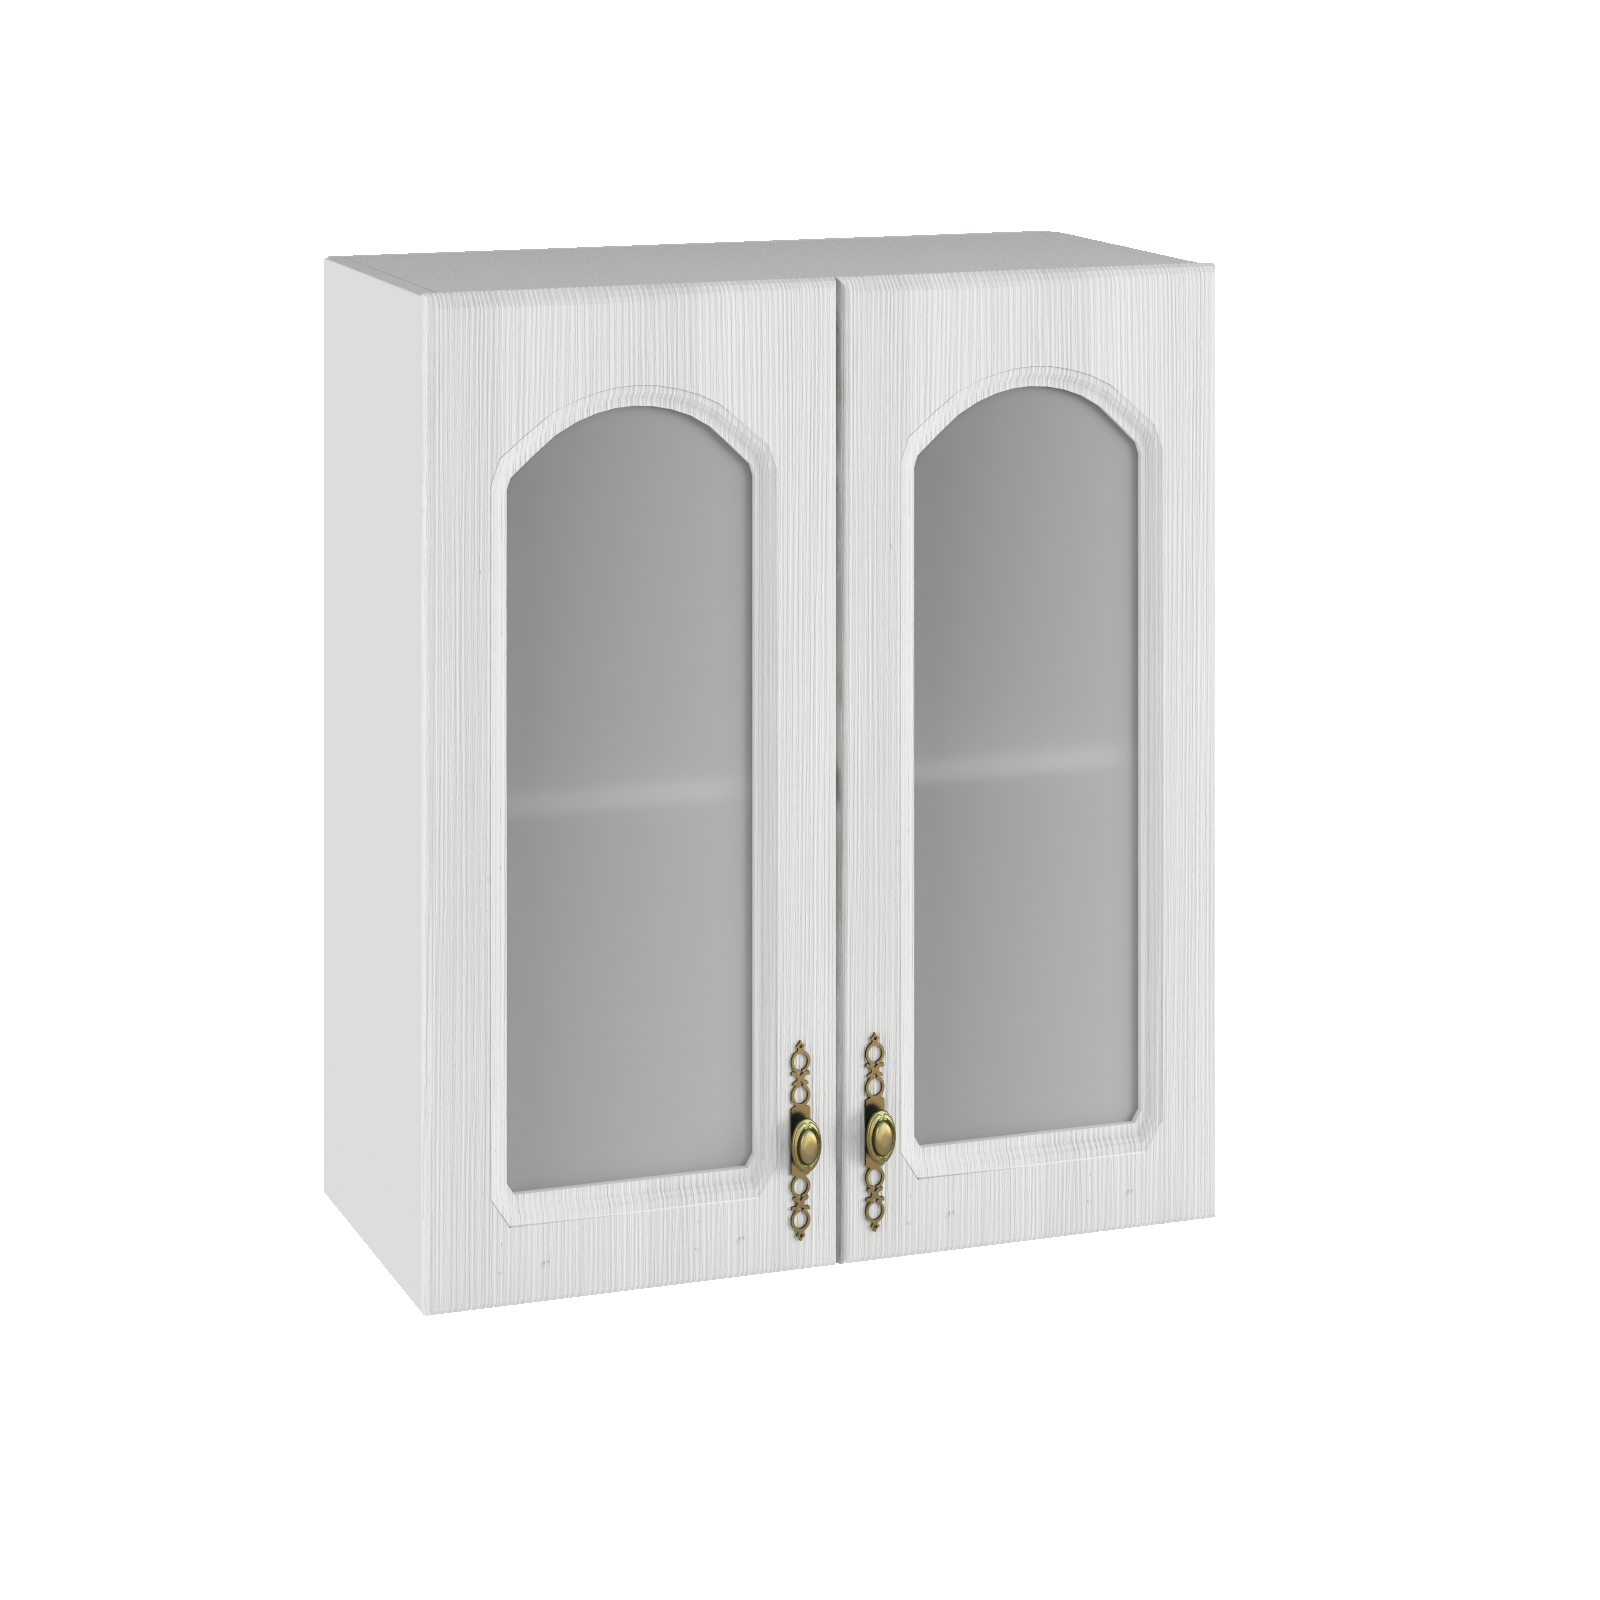 Кухня Монако ПС 600 Шкаф верхний стекло